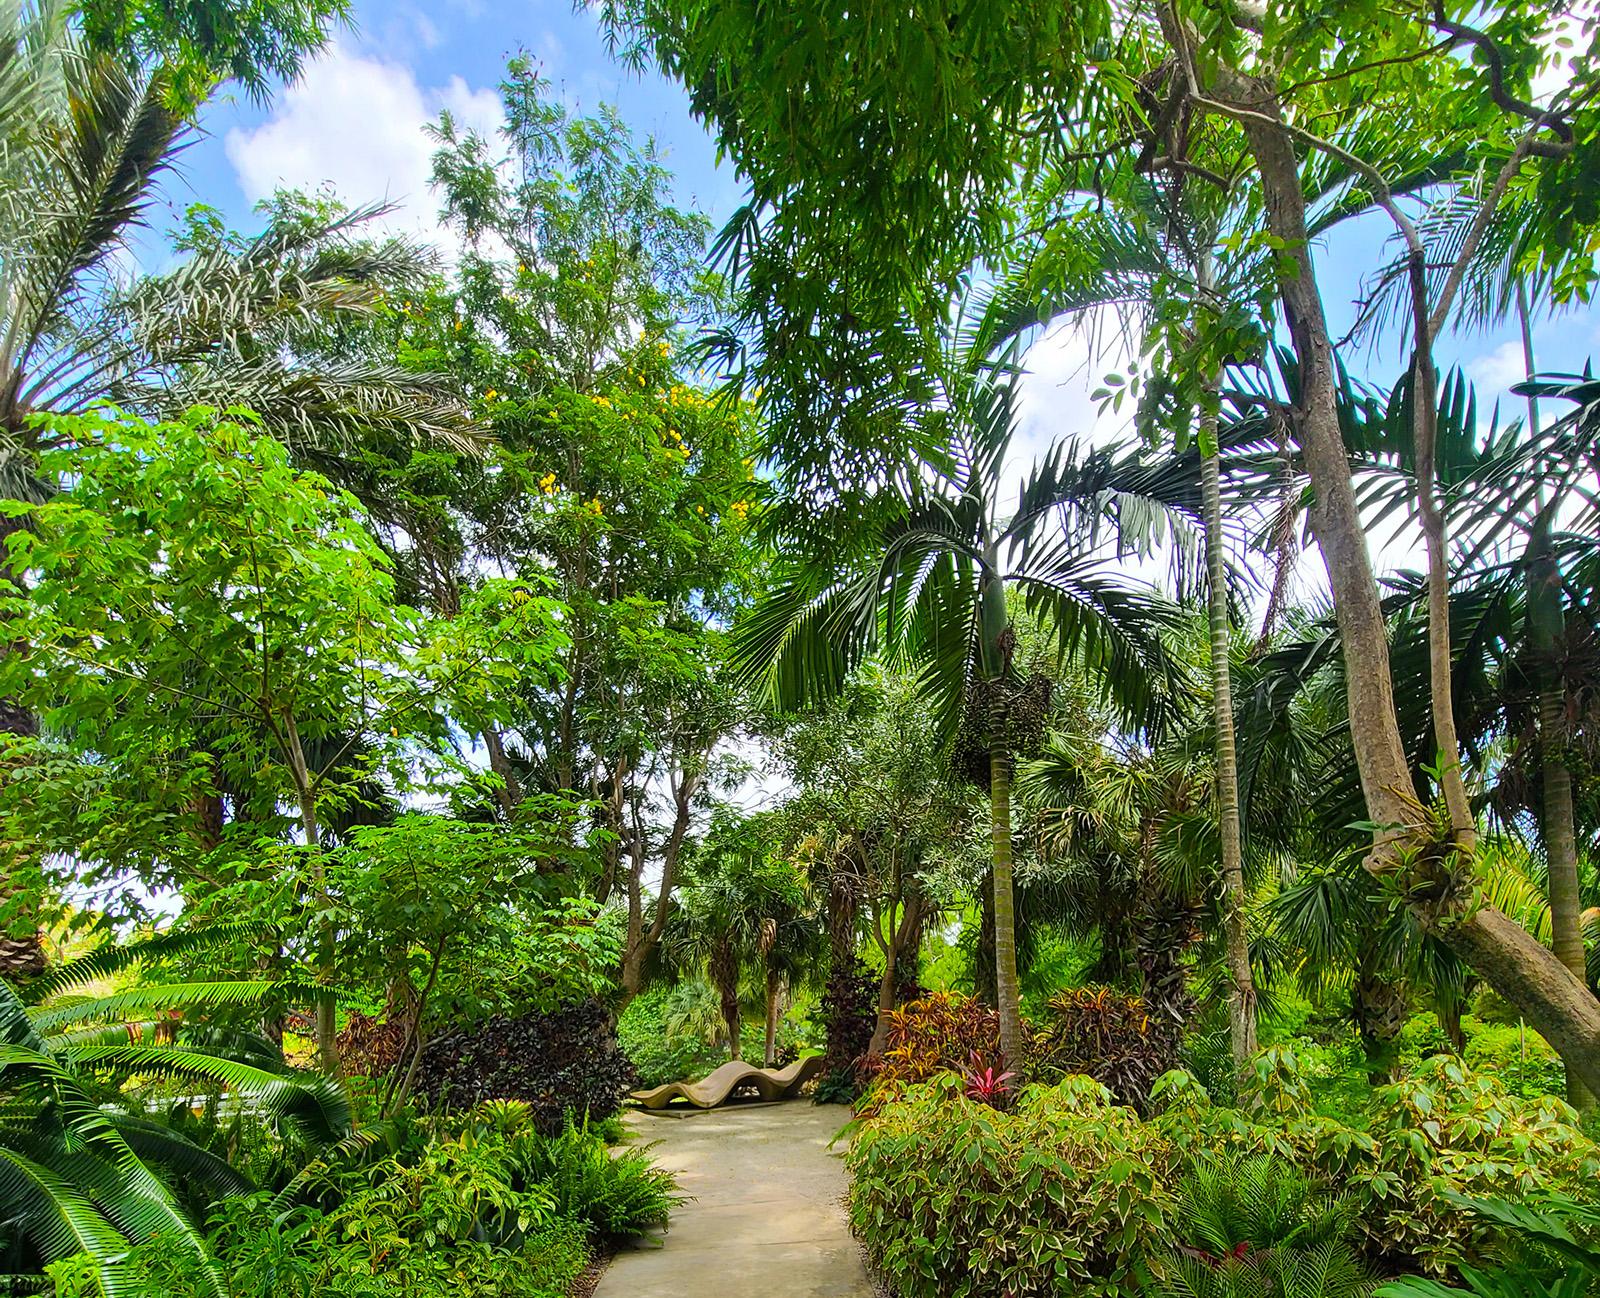 Mounts Botanical Garden (Photo by Melissa Carter)